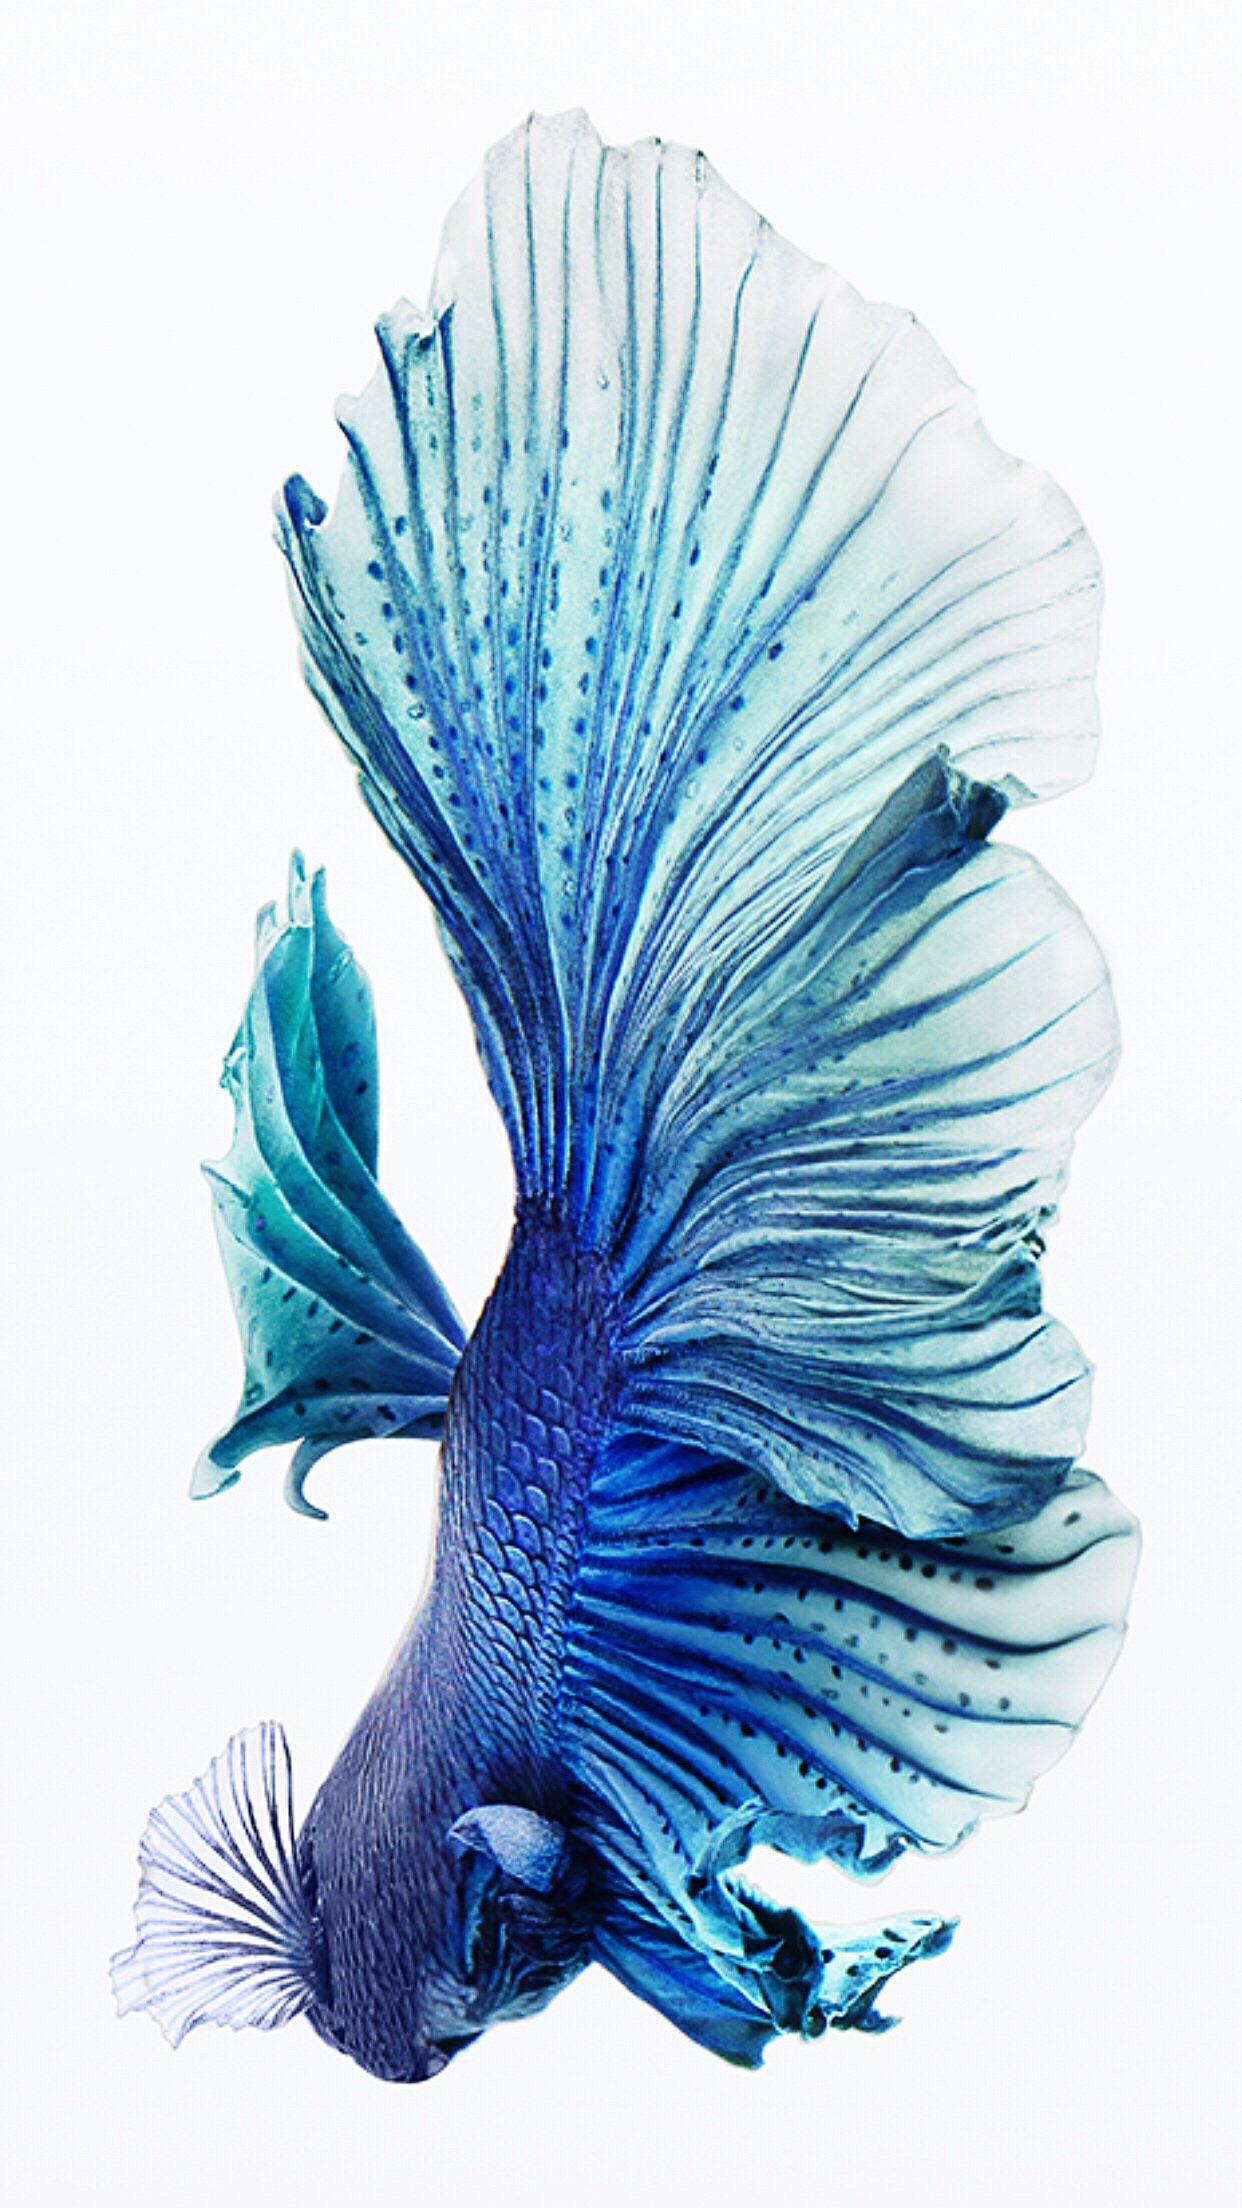 Wallpaper iphone fish - Blue Fish 1242 Png 586416 1242 2208